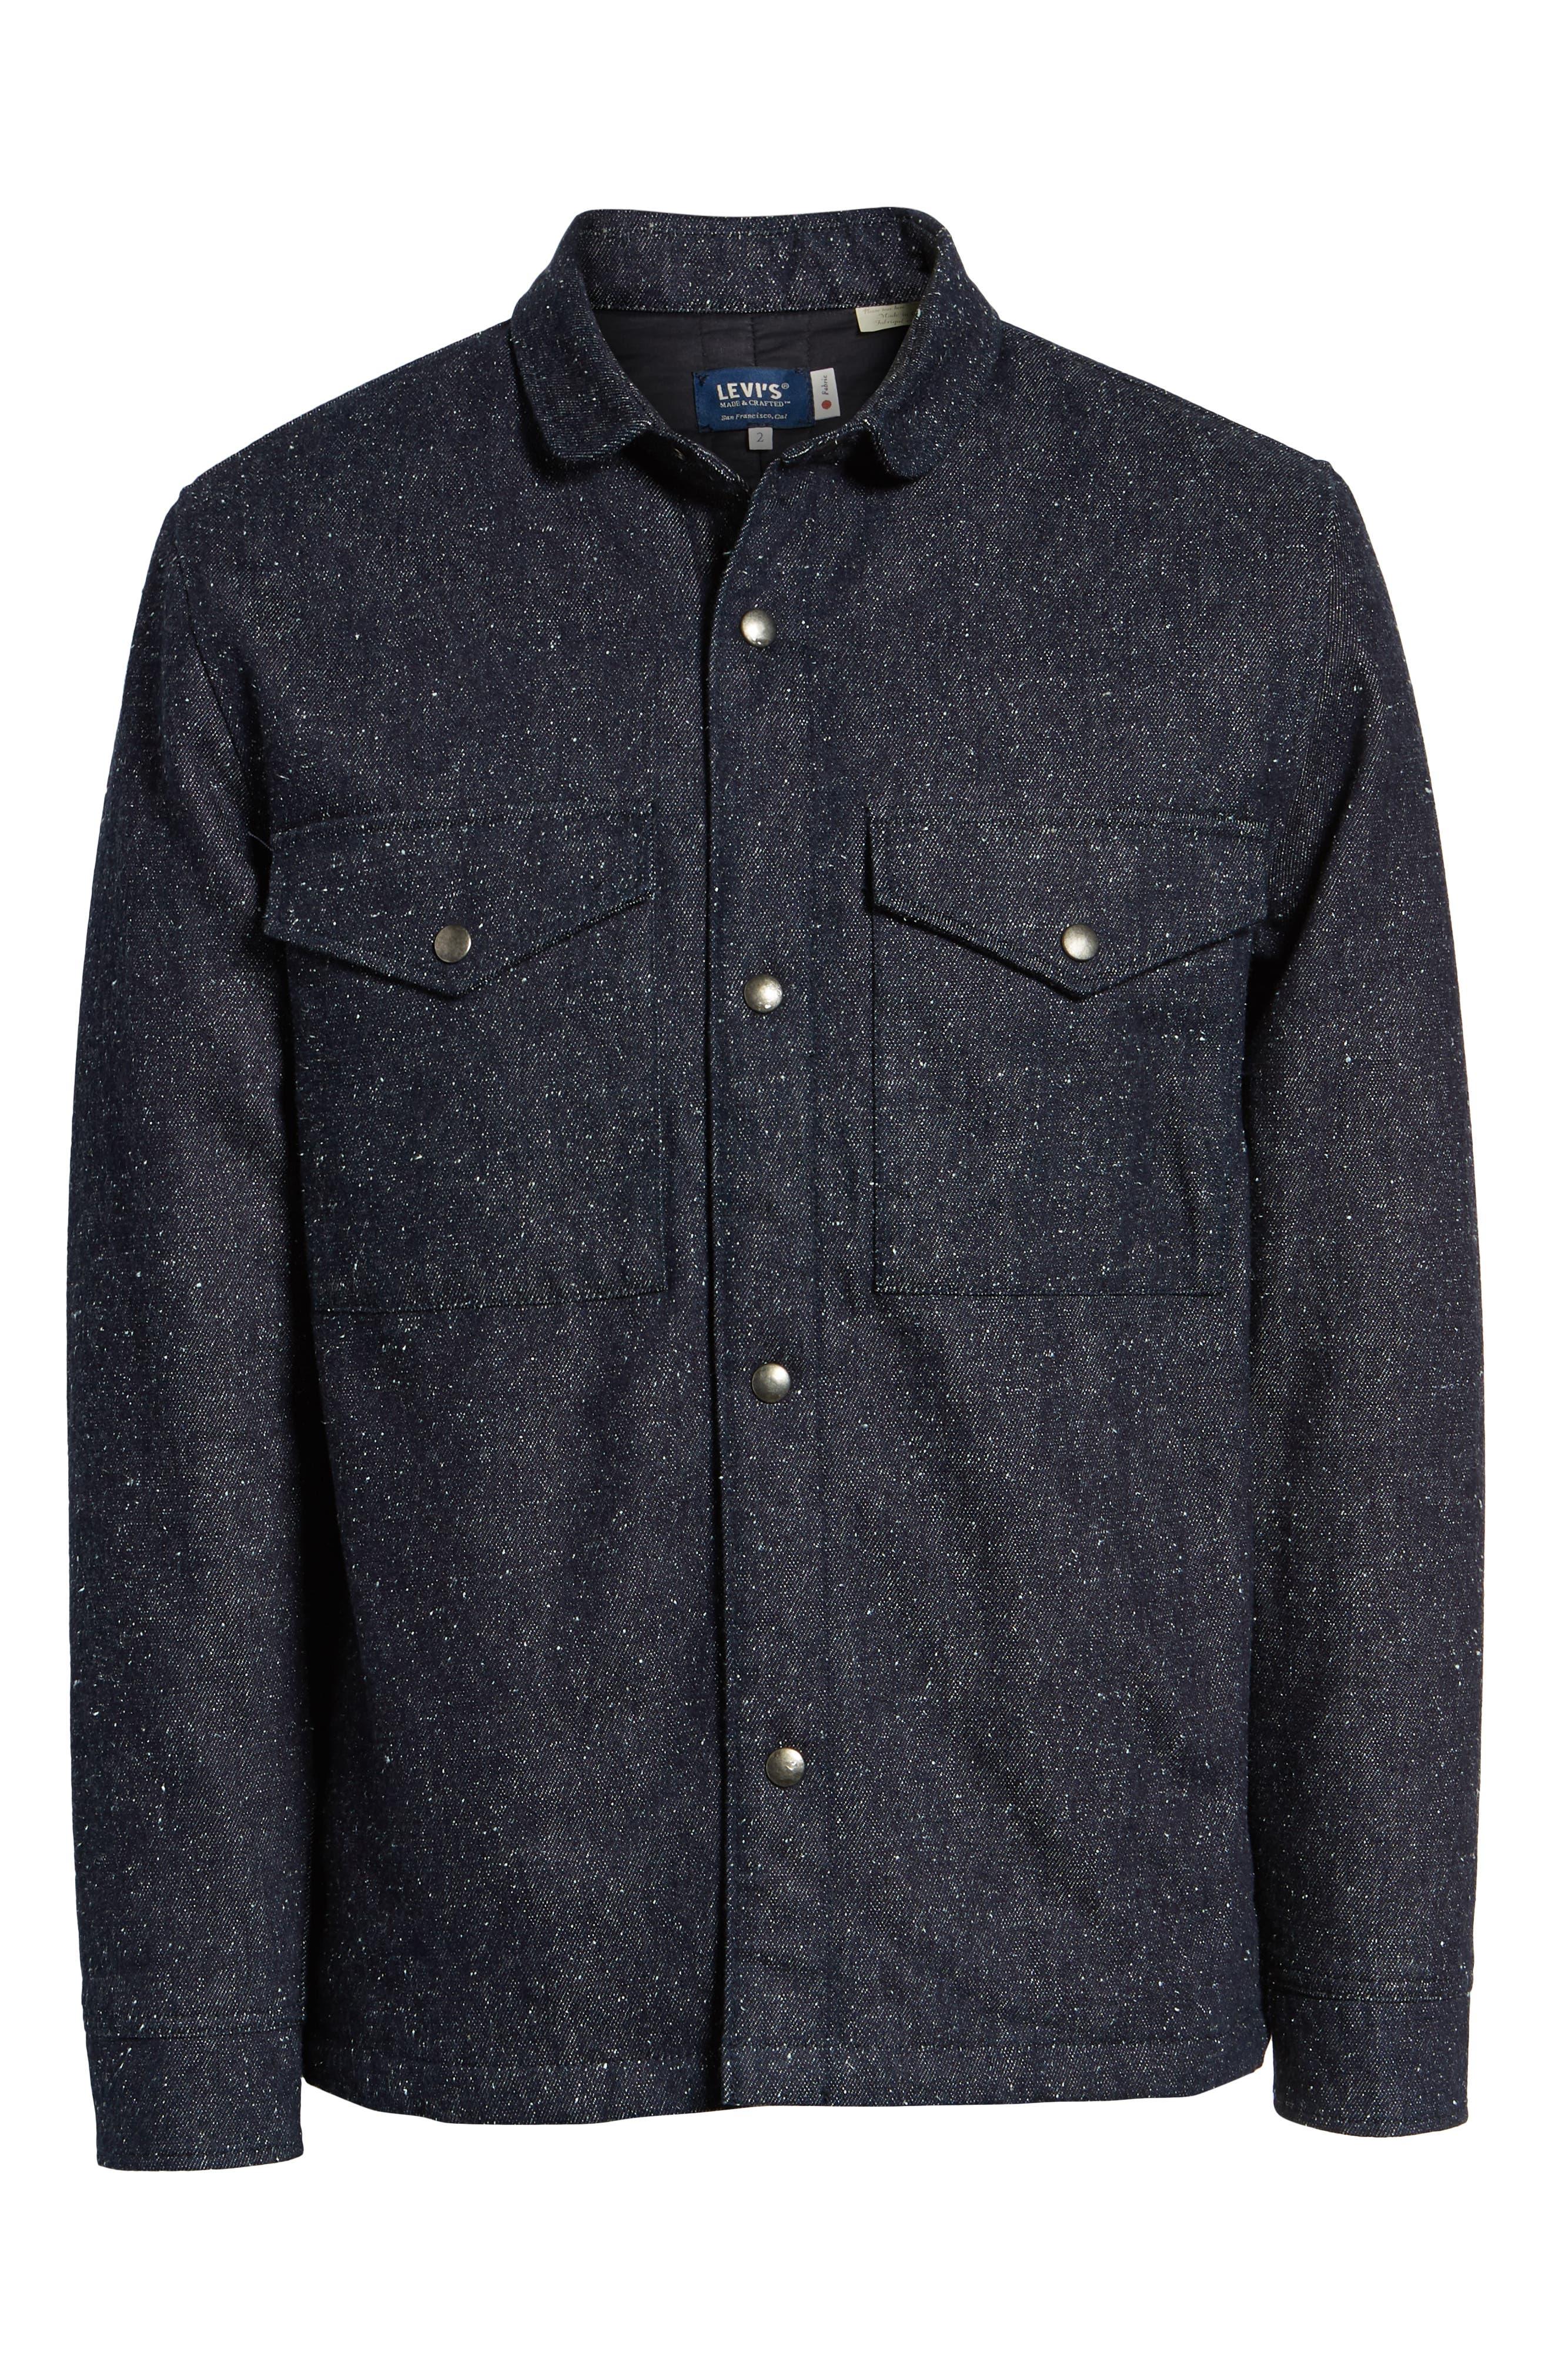 Nep Shirt Jacket,                             Alternate thumbnail 6, color,                             DENIM BLUES